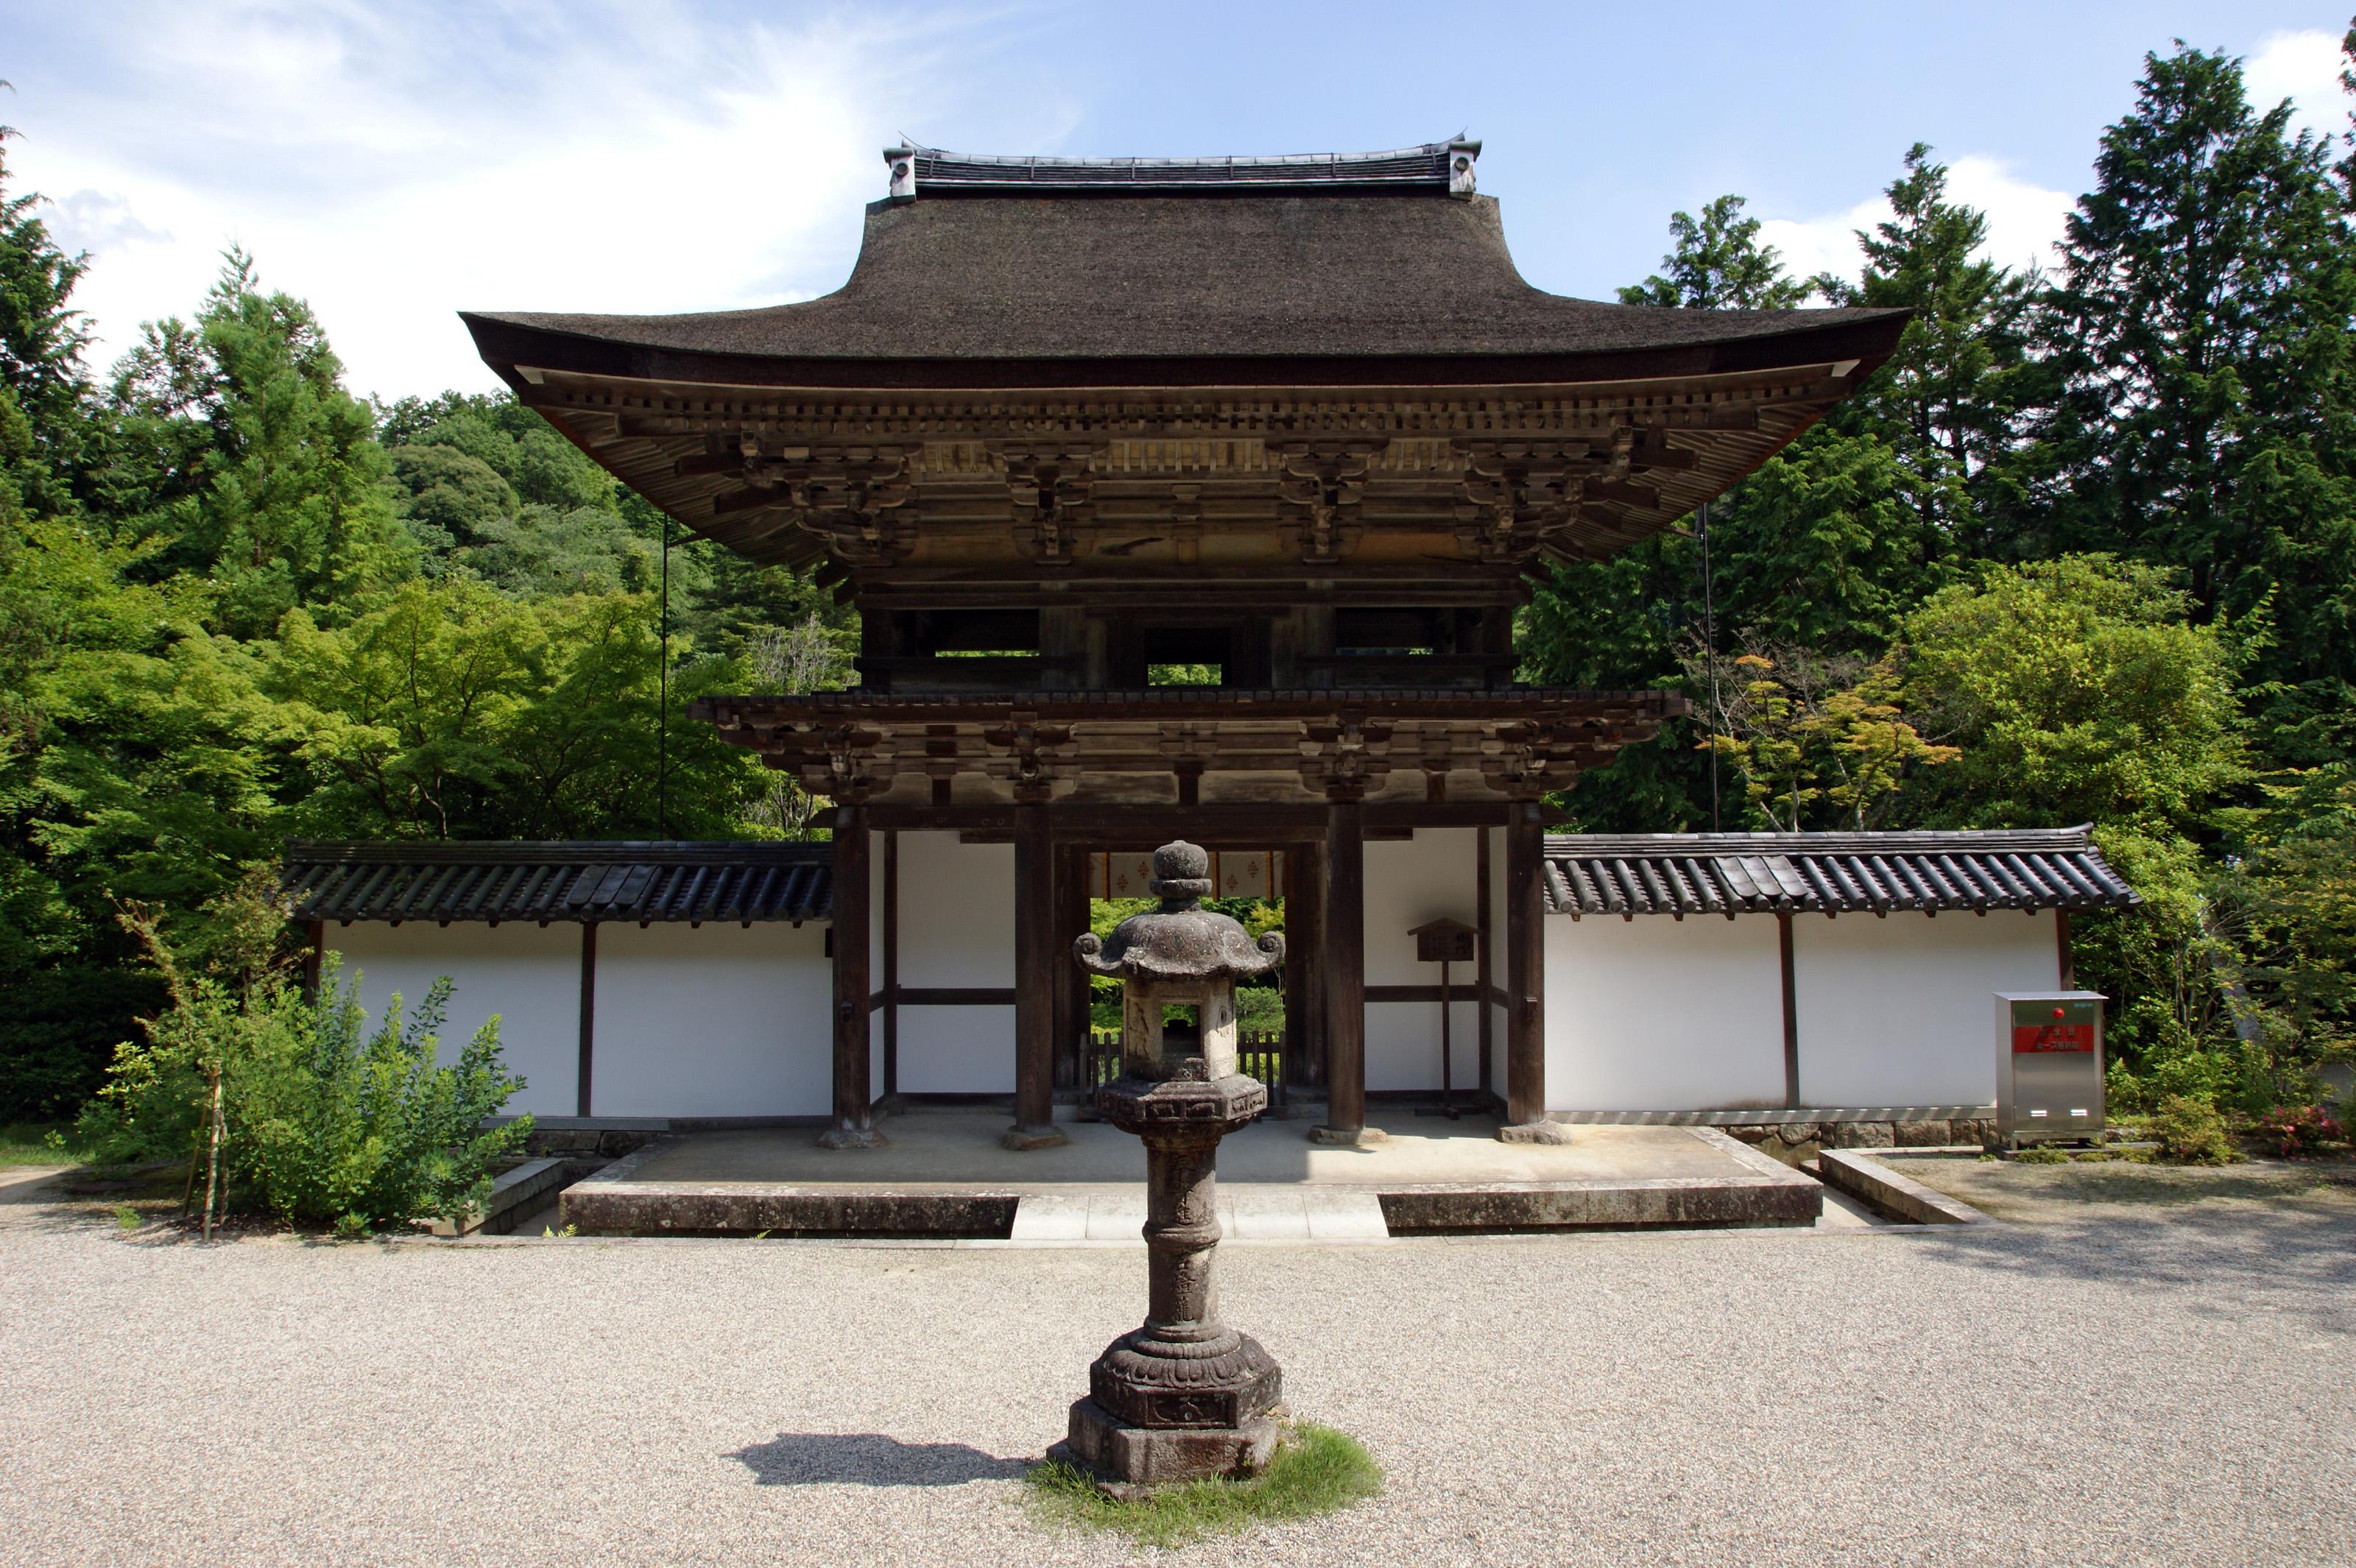 File:Enjoji Nara14sb3200.jpg - Wikimedia Commons